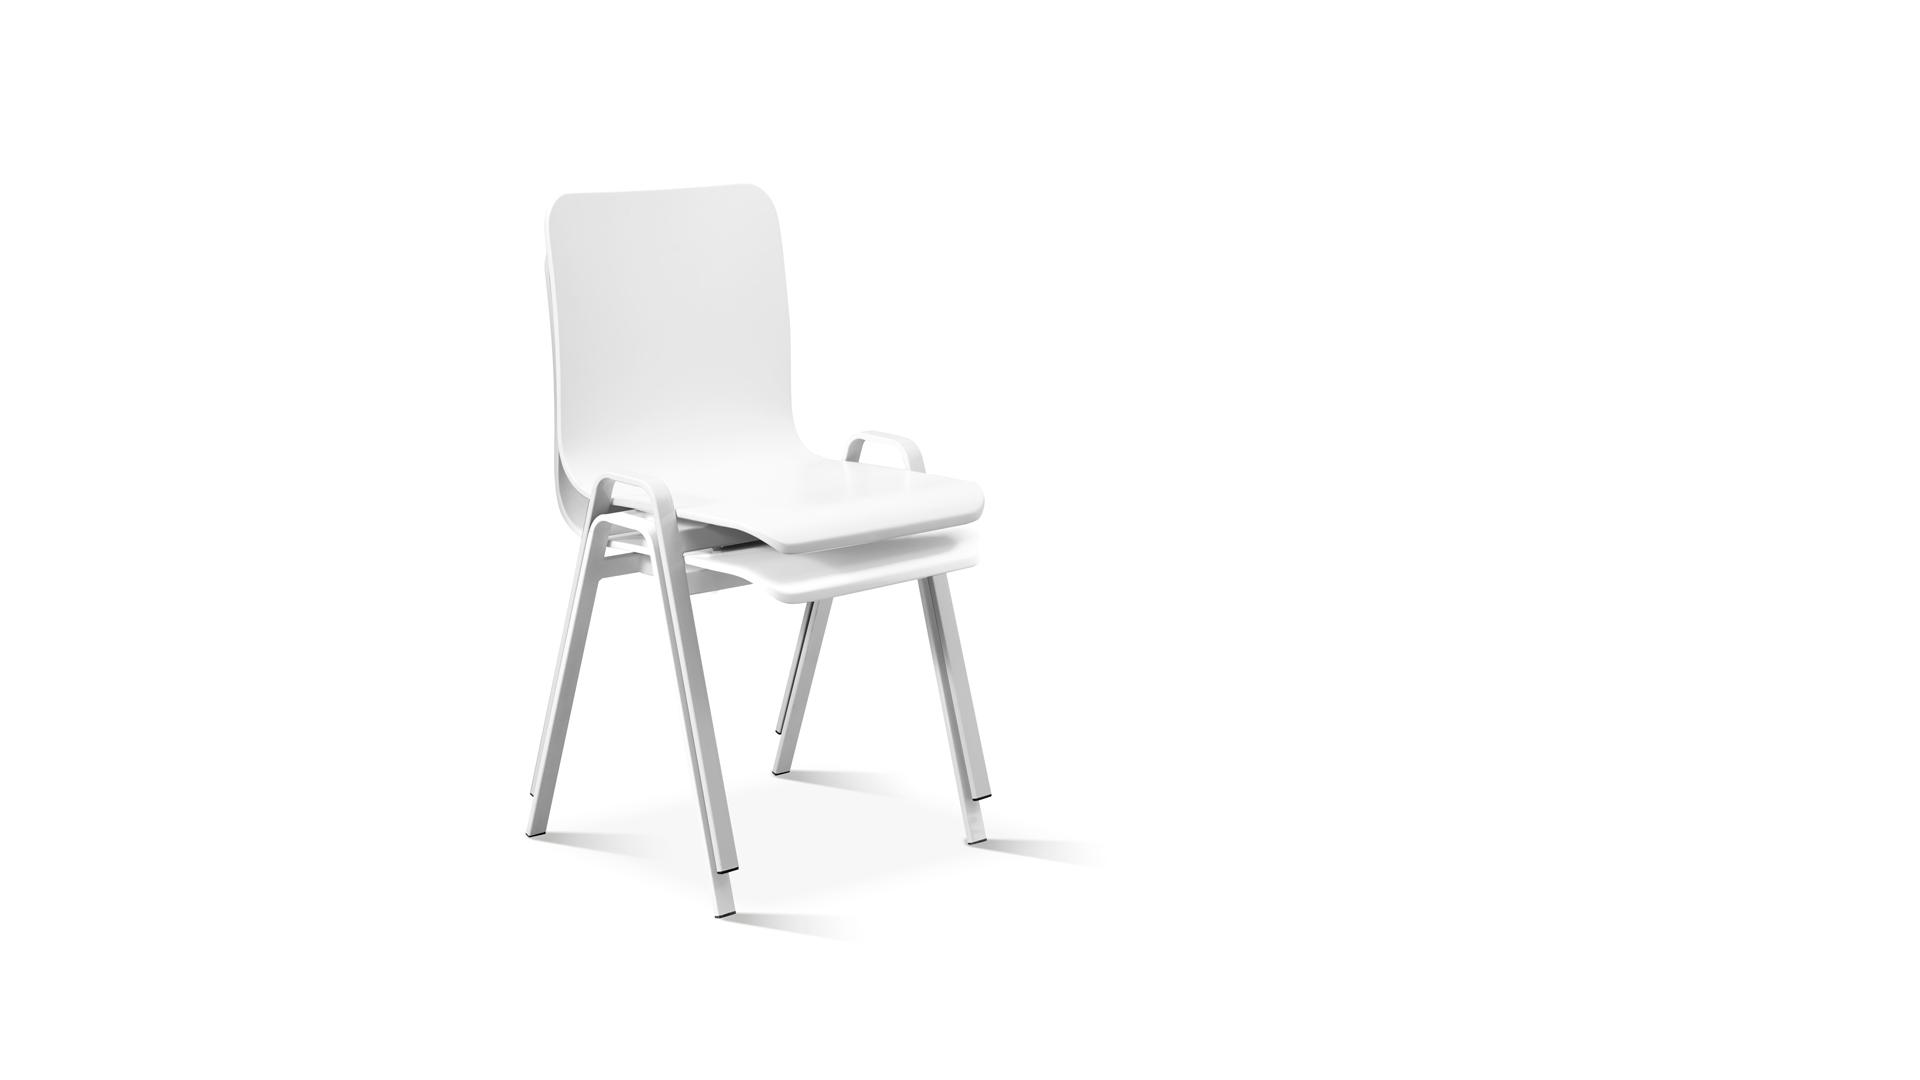 A字形椅腿,采用空心铁管弯折工艺,内角度精准控制在108°,上紧下松的布局,轻松叠摞收纳,椅座底面搭配有4个防护套,保证多把叠摞不划伤。 ?x-oss-process=image/format,jpg/interlace,1